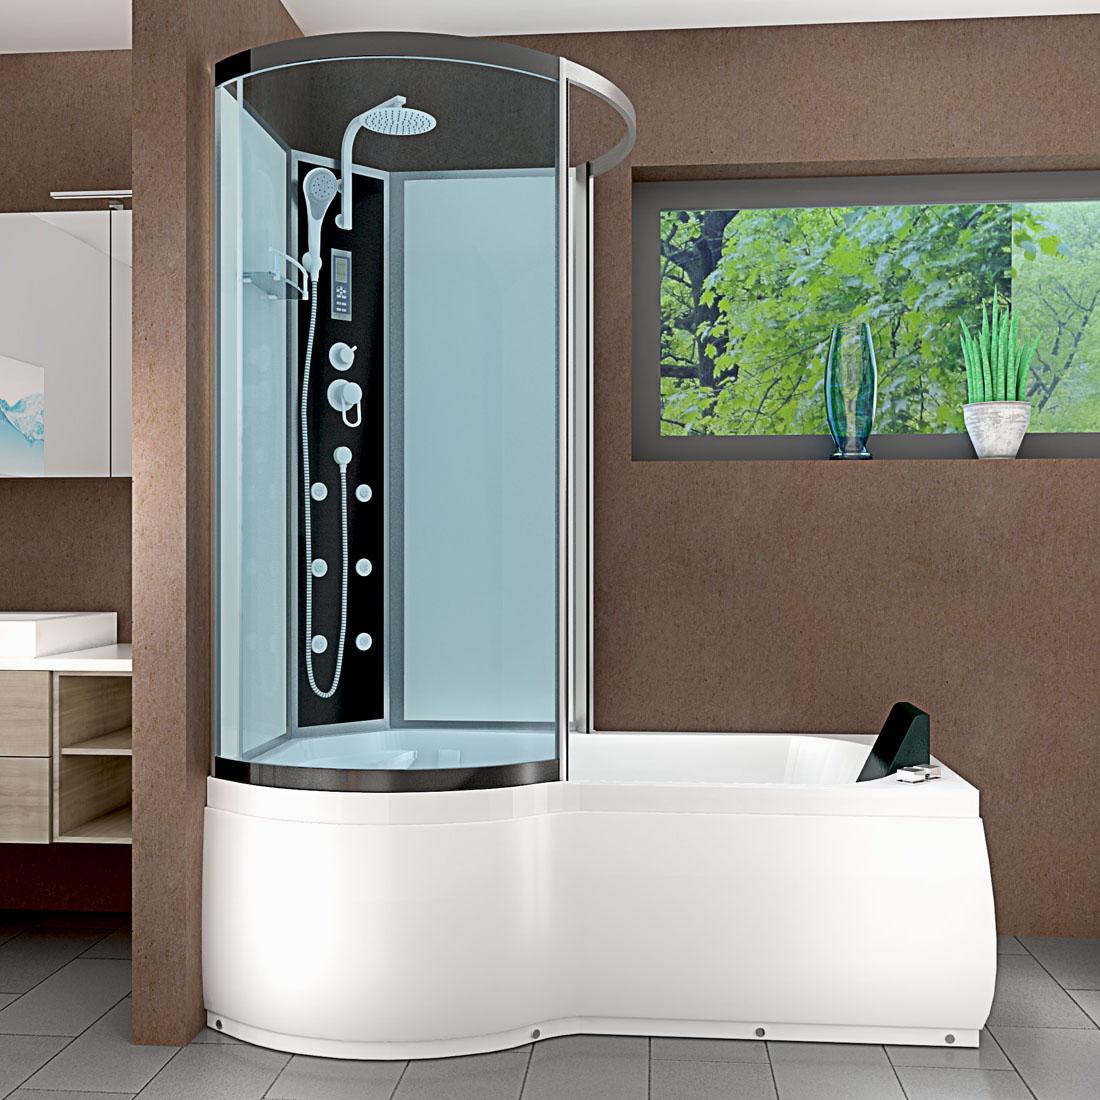 acquavapore dtp8050 a003r whirlpool wanne duschtempel dusche duschkabine 98x170 ebay. Black Bedroom Furniture Sets. Home Design Ideas